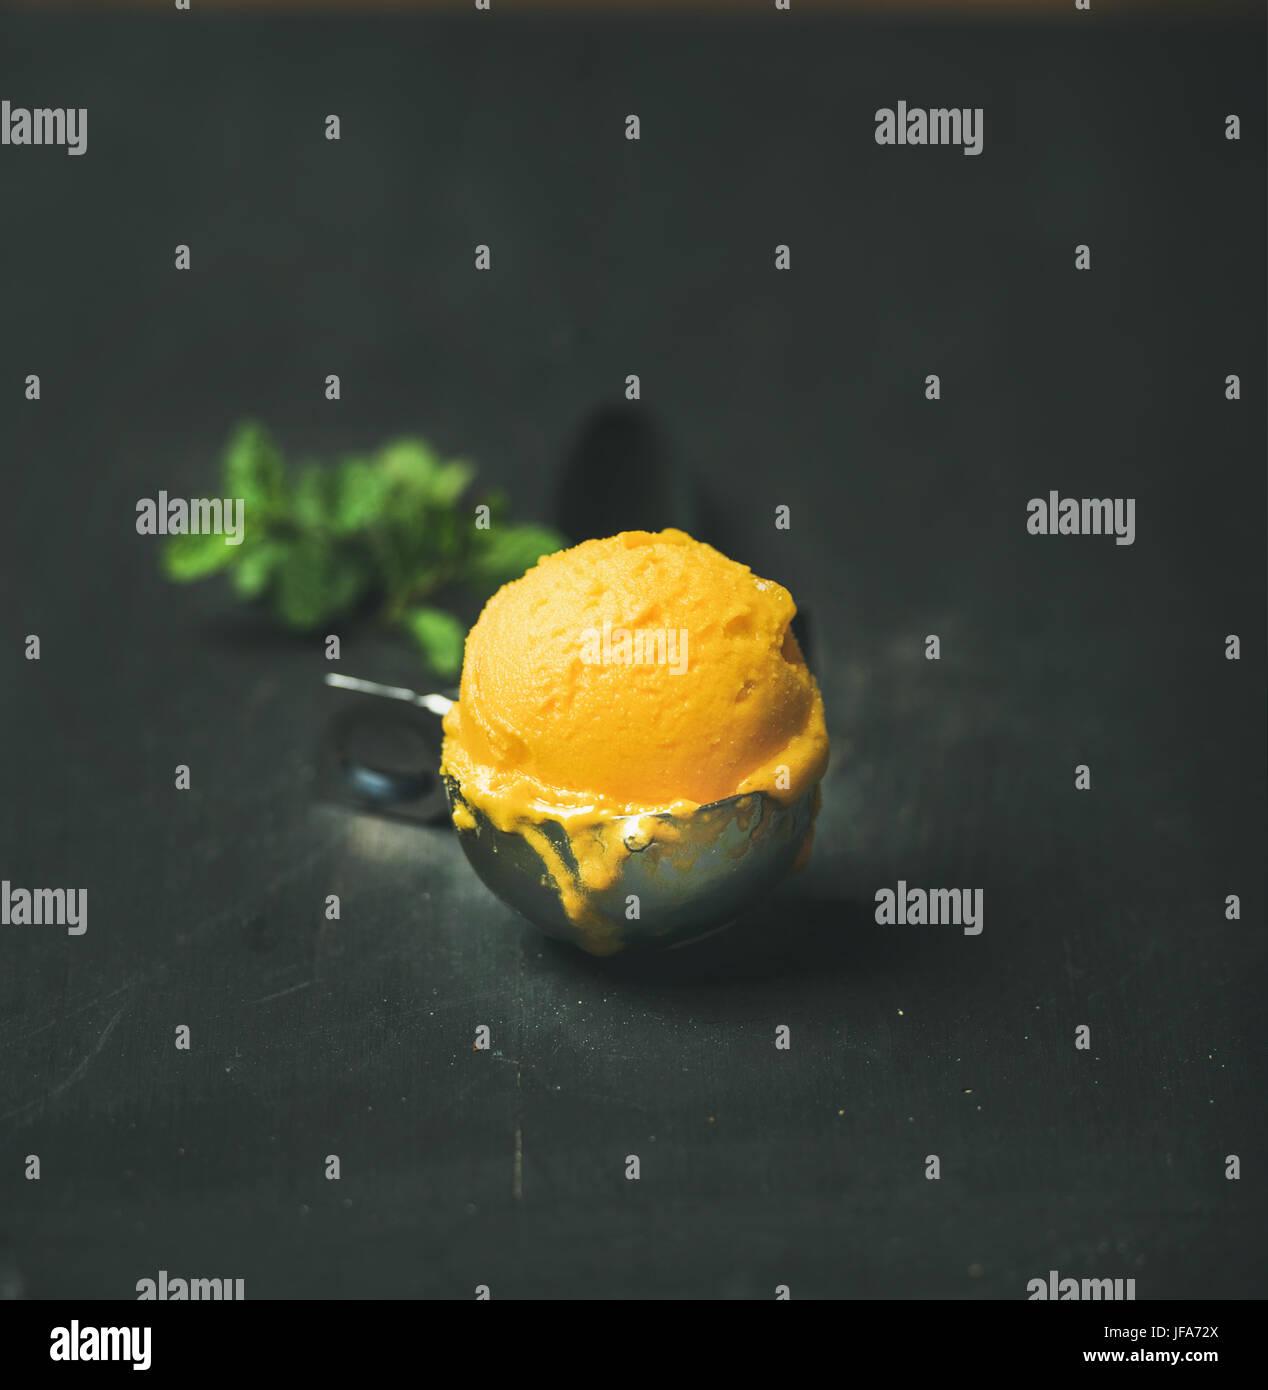 Mango sorbet ice cream scoop, square crop, copy space - Stock Image